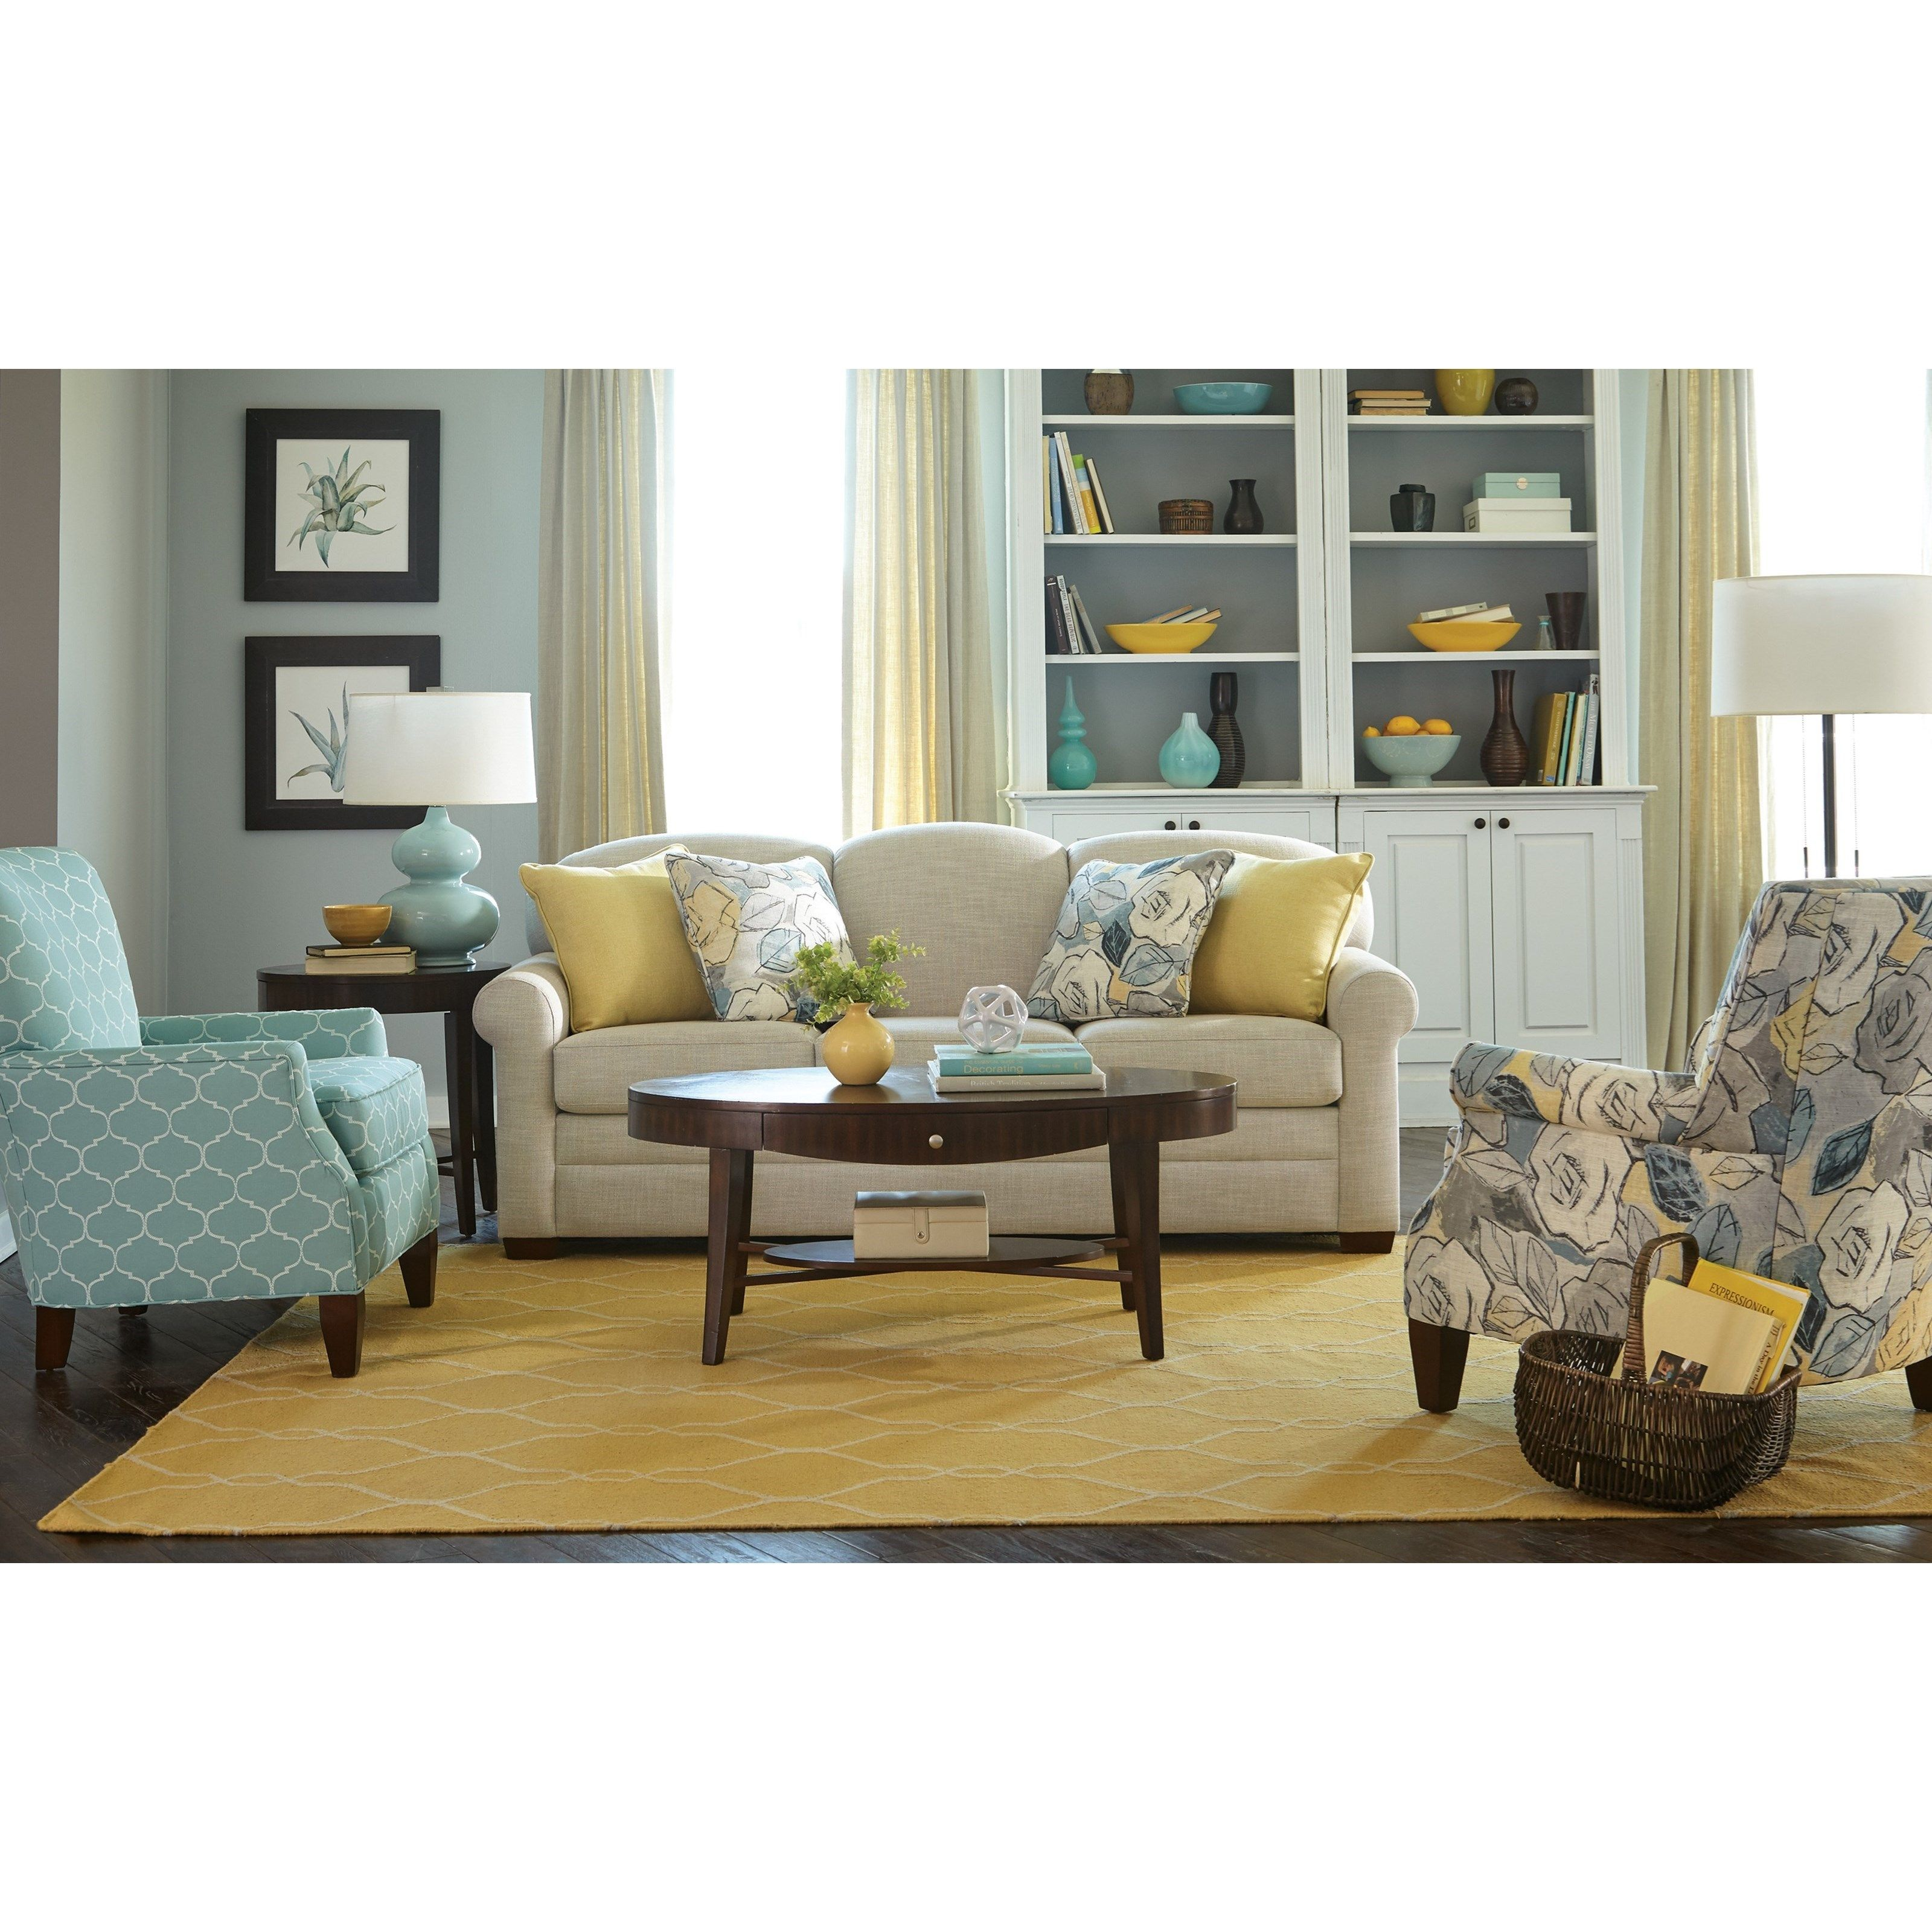 Camelback Sleeper Sofa with Queen Memoryfoam Mattress by